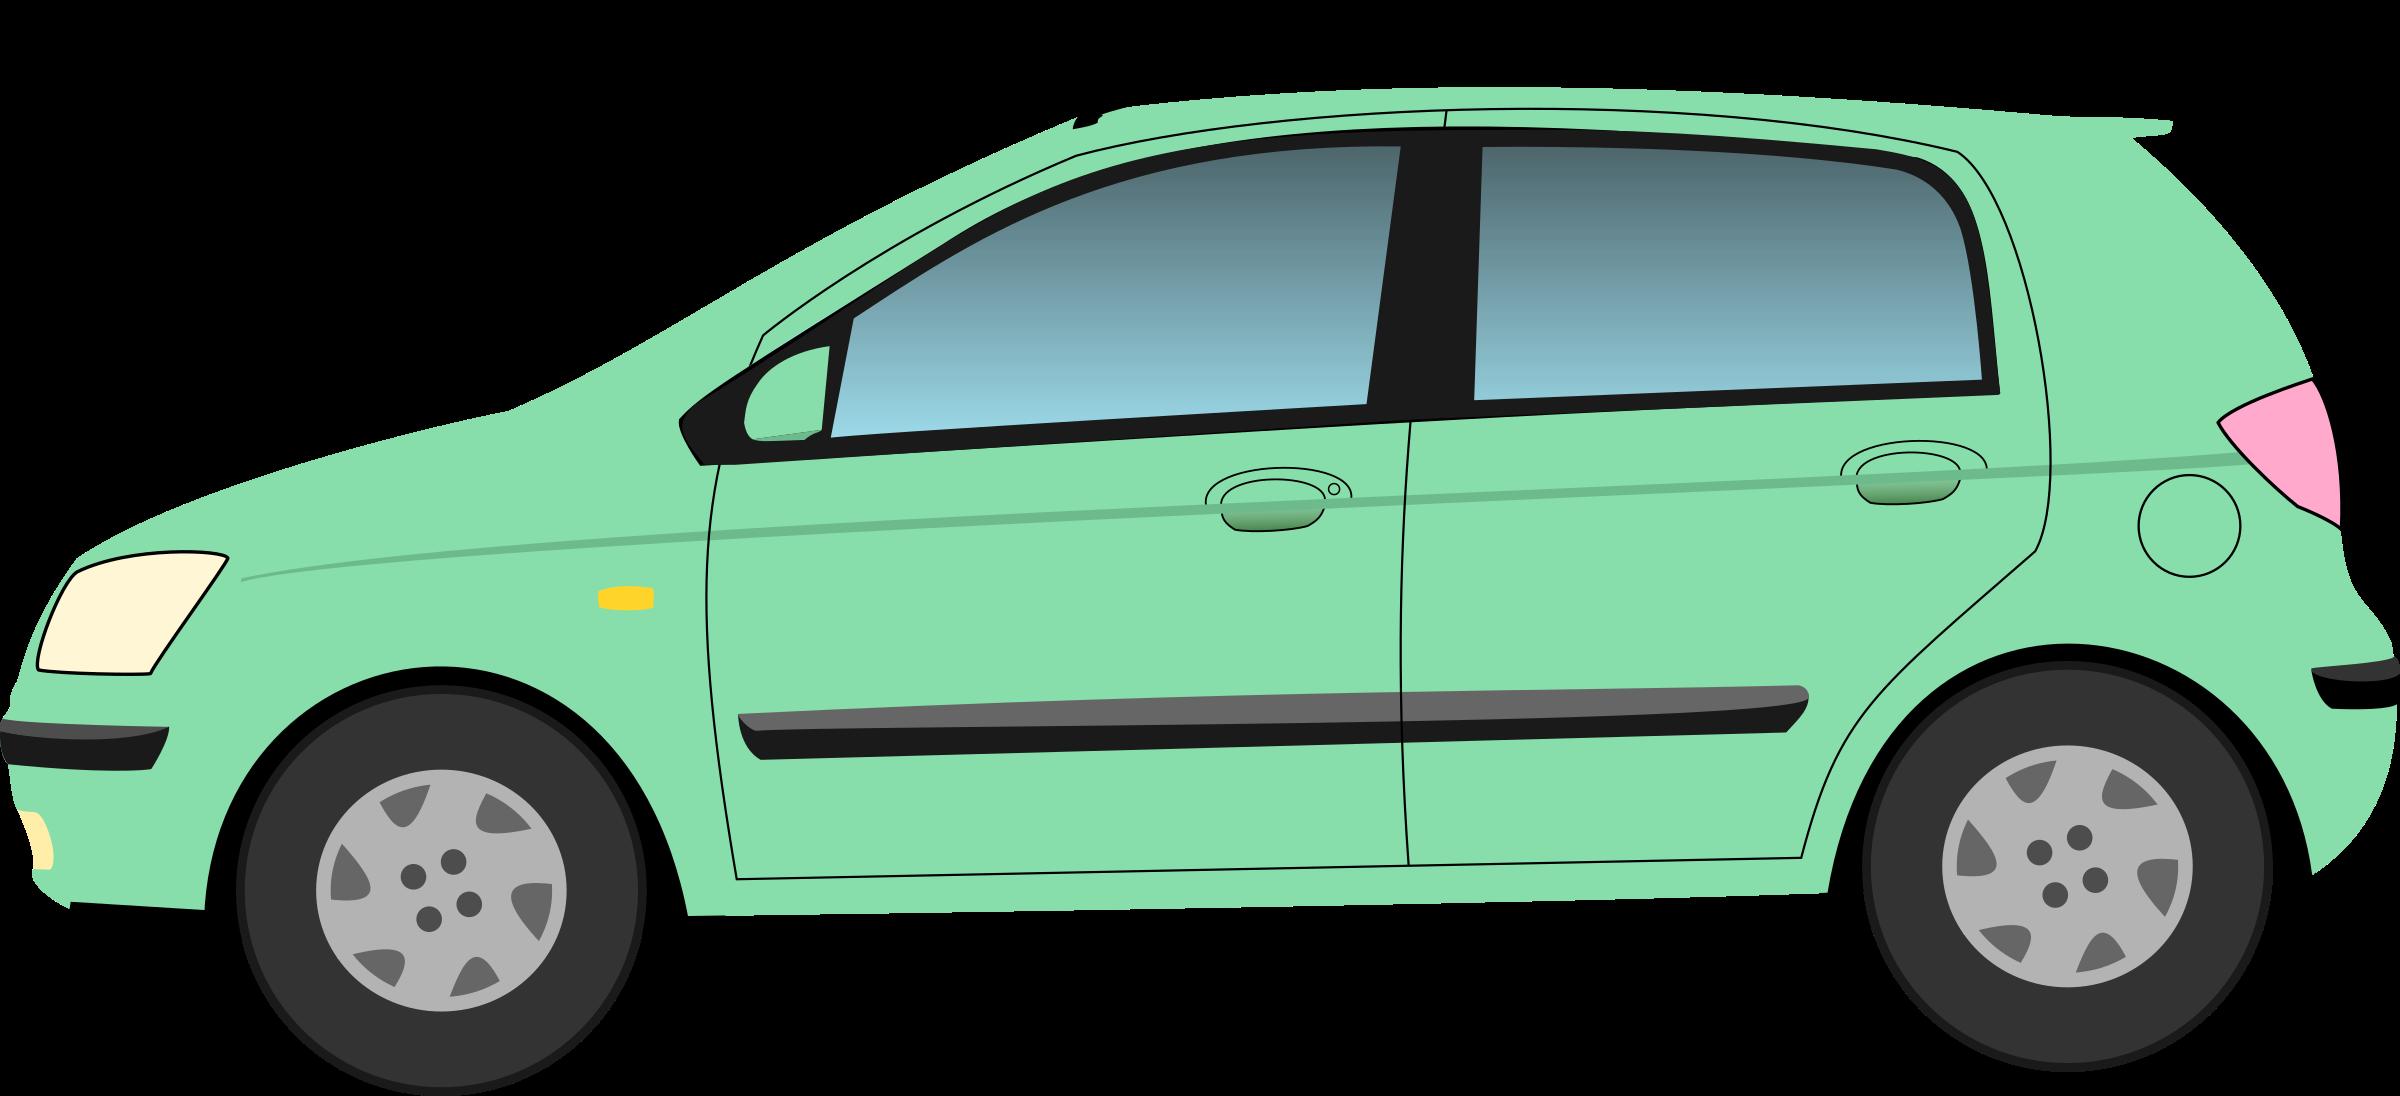 clipart cars green